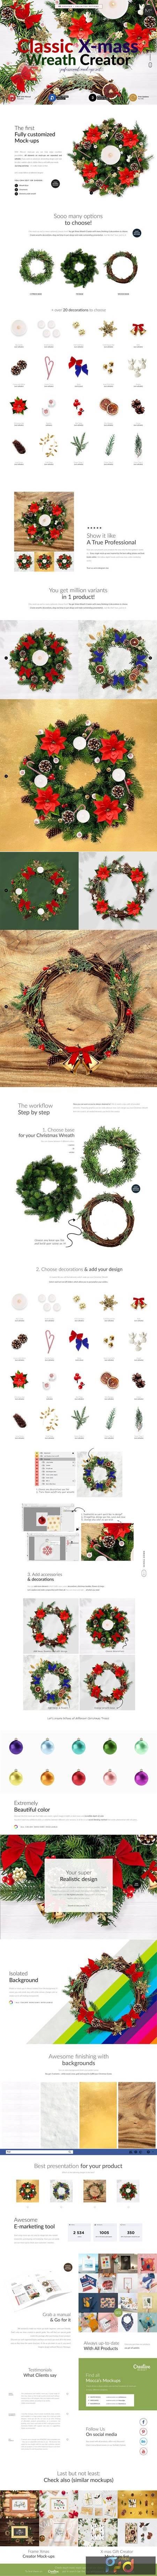 3x Christmass Wreath Creator Mock-up 5708215 1